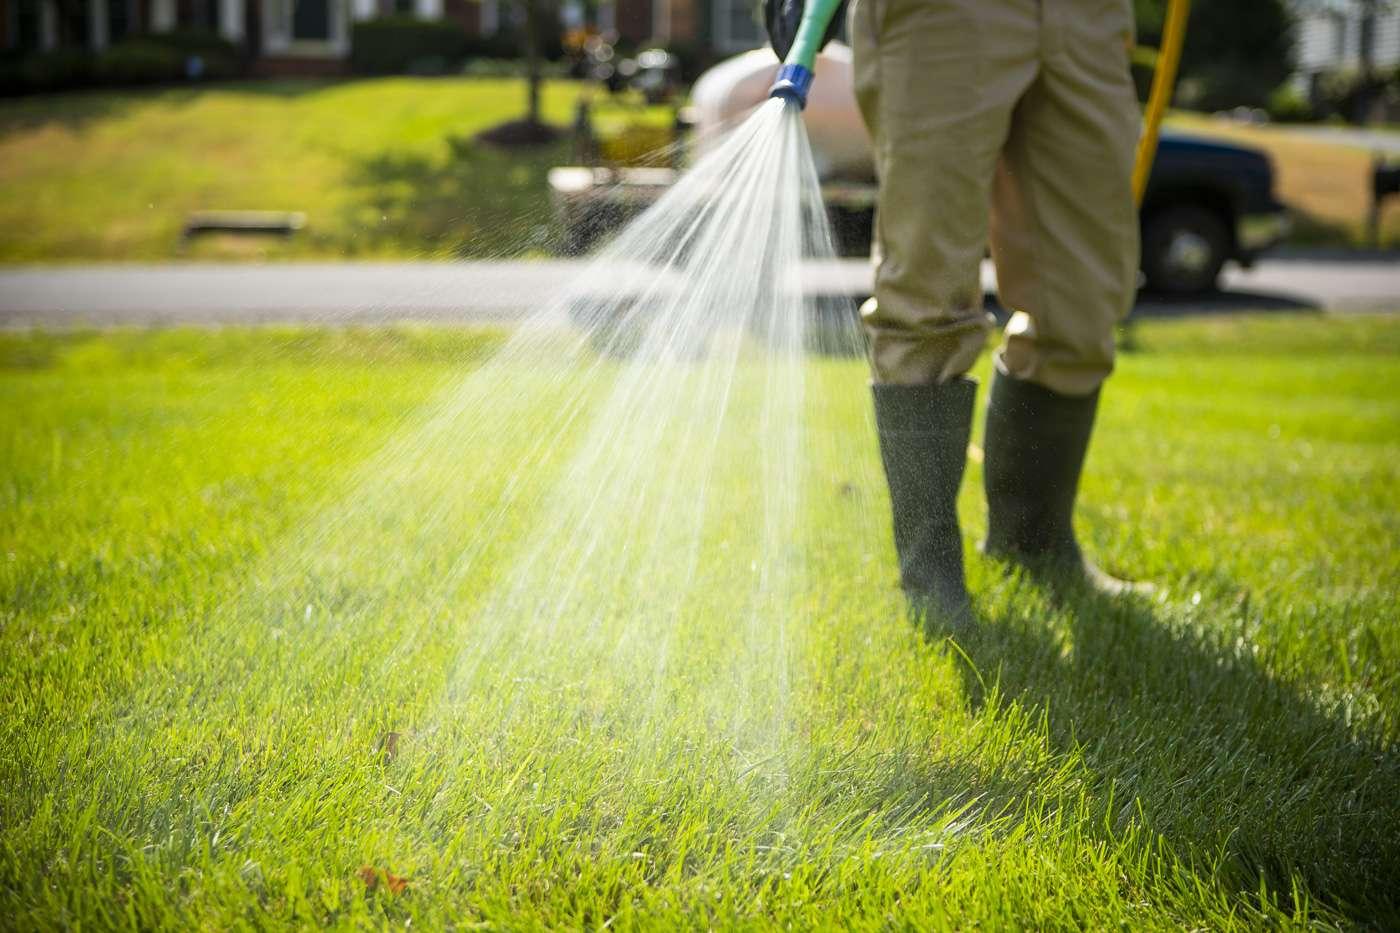 technician-lawn-spraying-15